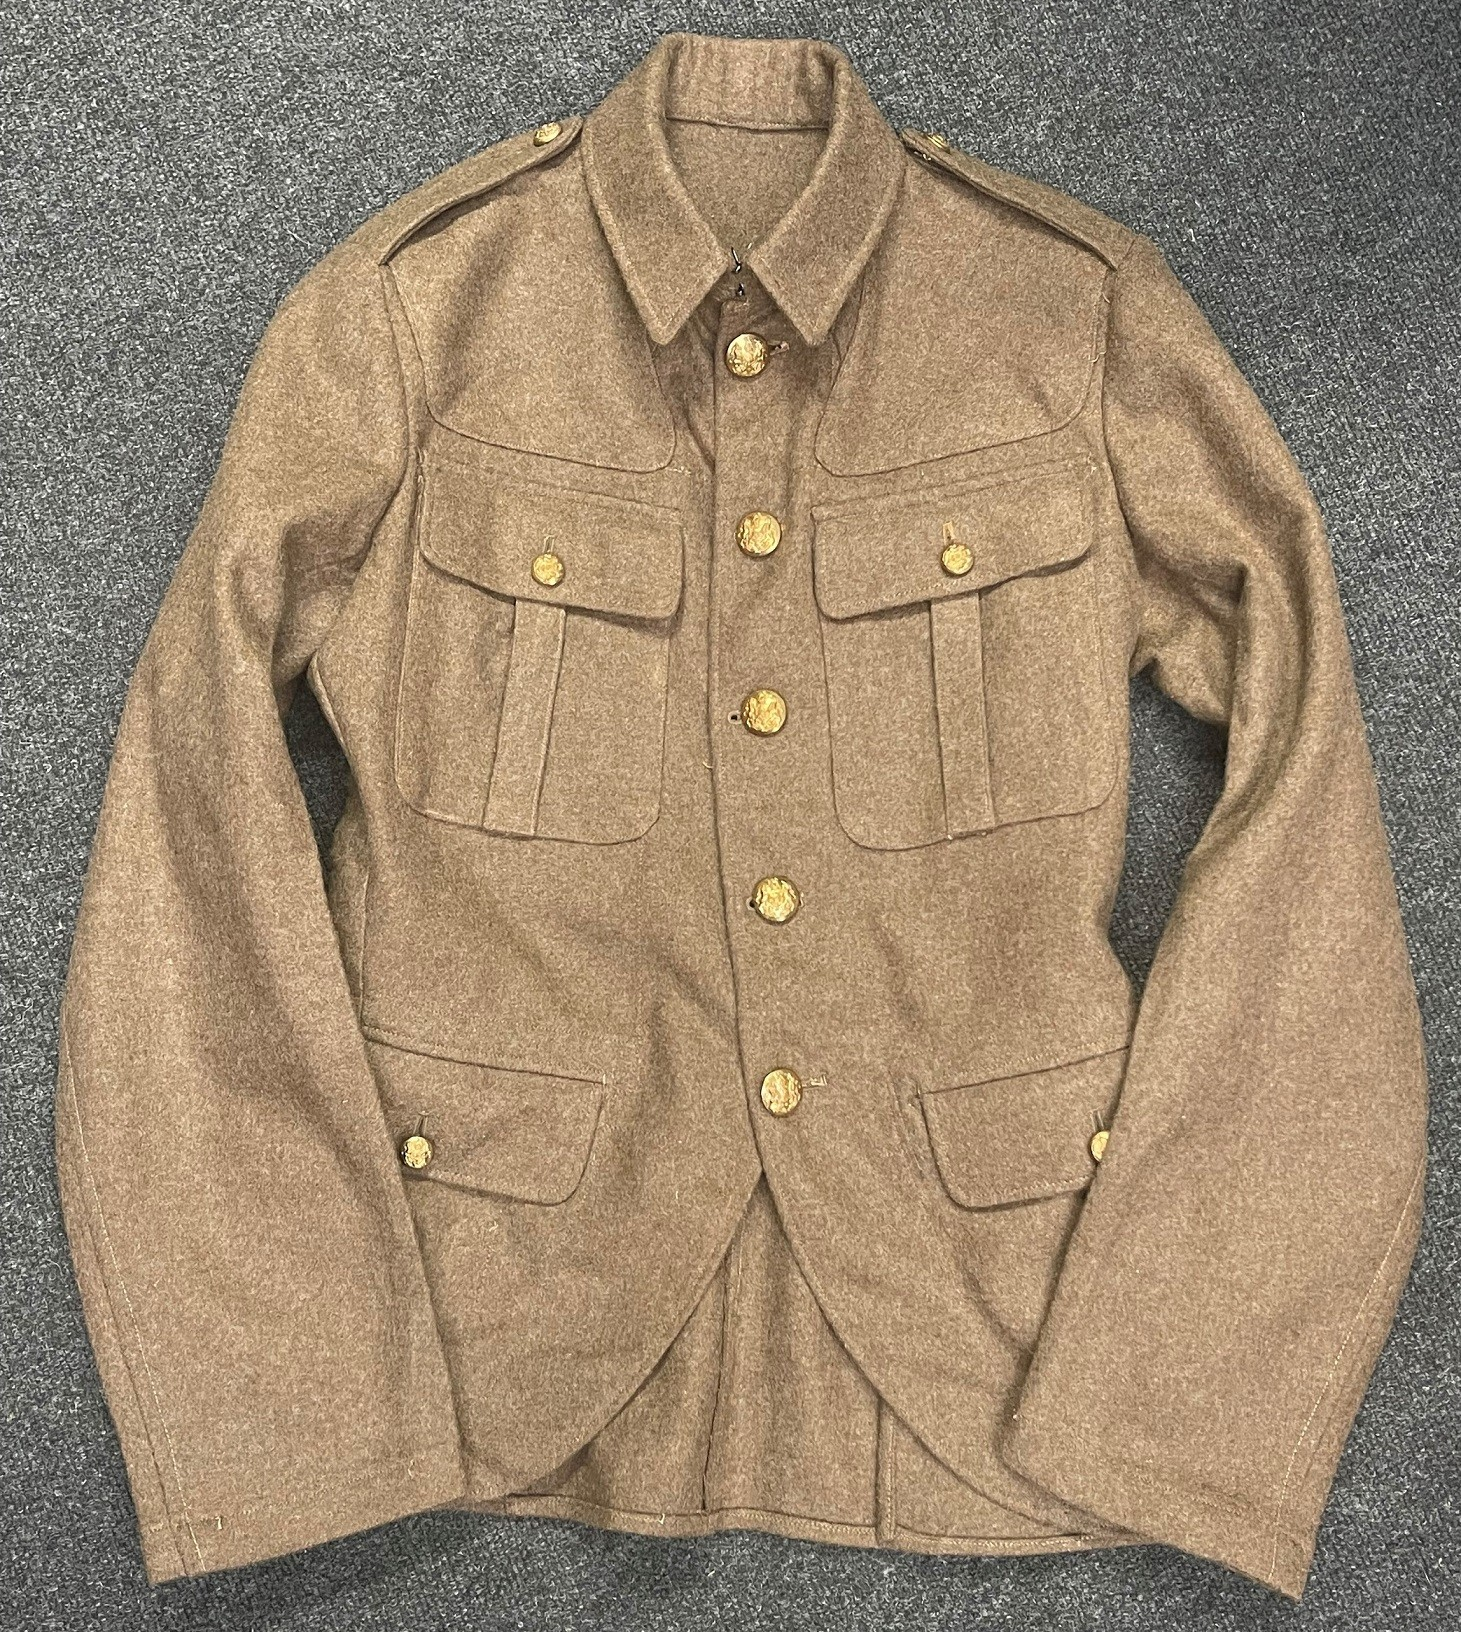 "WW2 British Jacket, Service Dress, OR Scottish Regiments. Size No 16 NS. Maker marked for ""J."